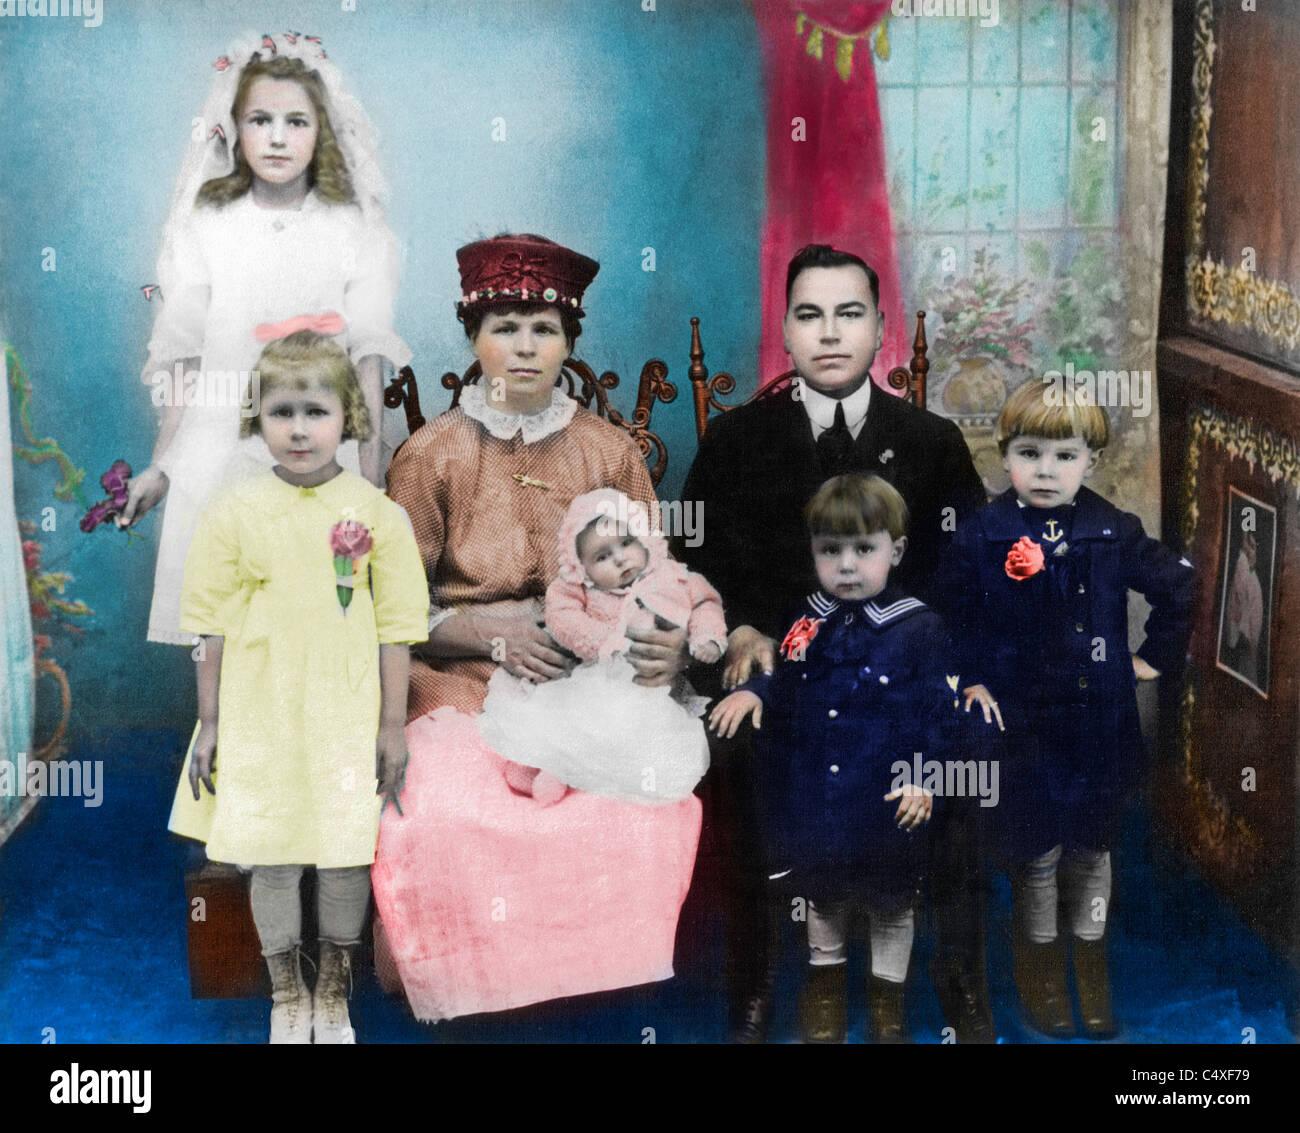 Colorized photo of Ukrainian immigrant family in America, circa 1920 - Stock Image